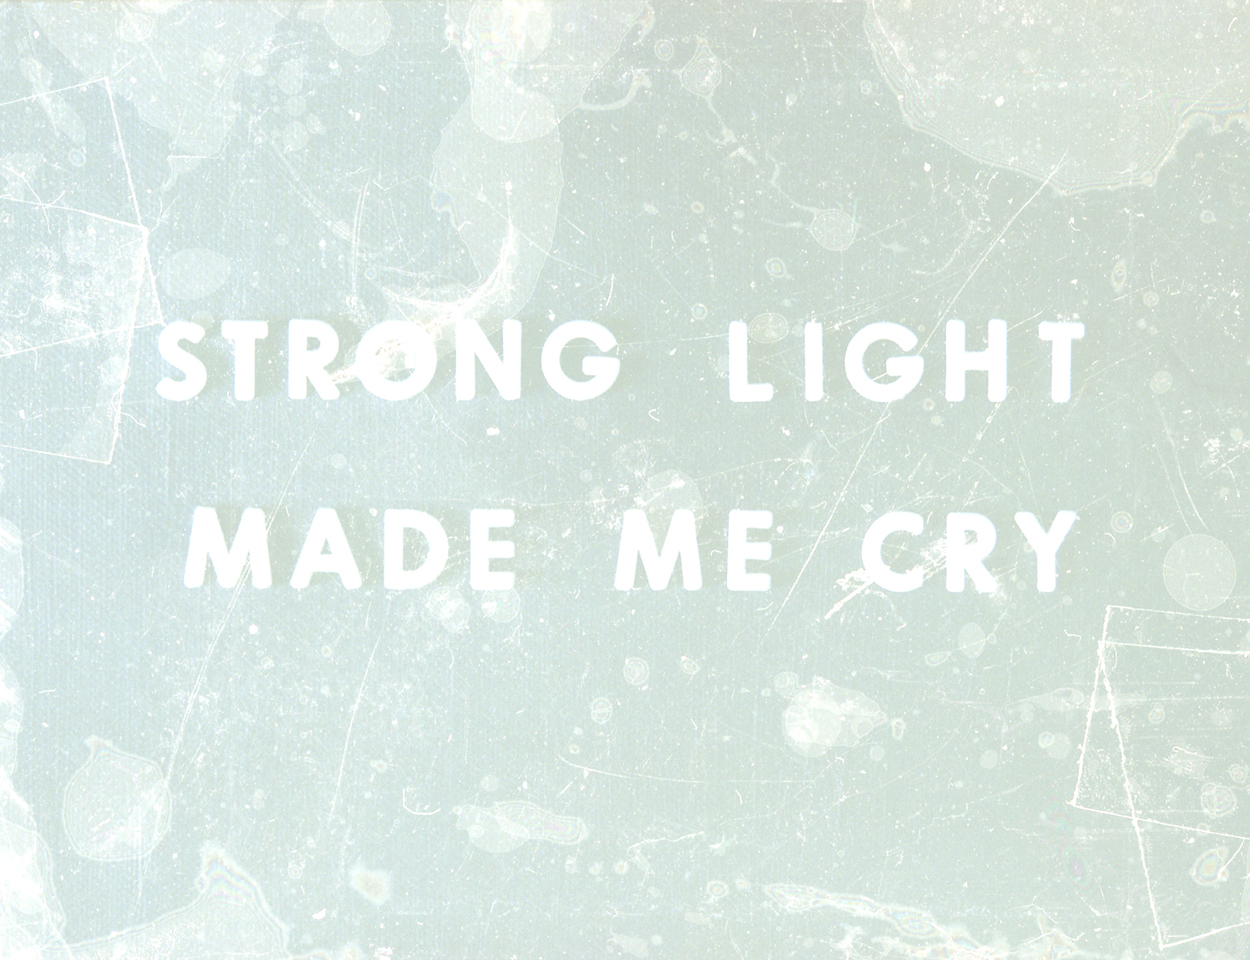 stronglight1rsz.jpg